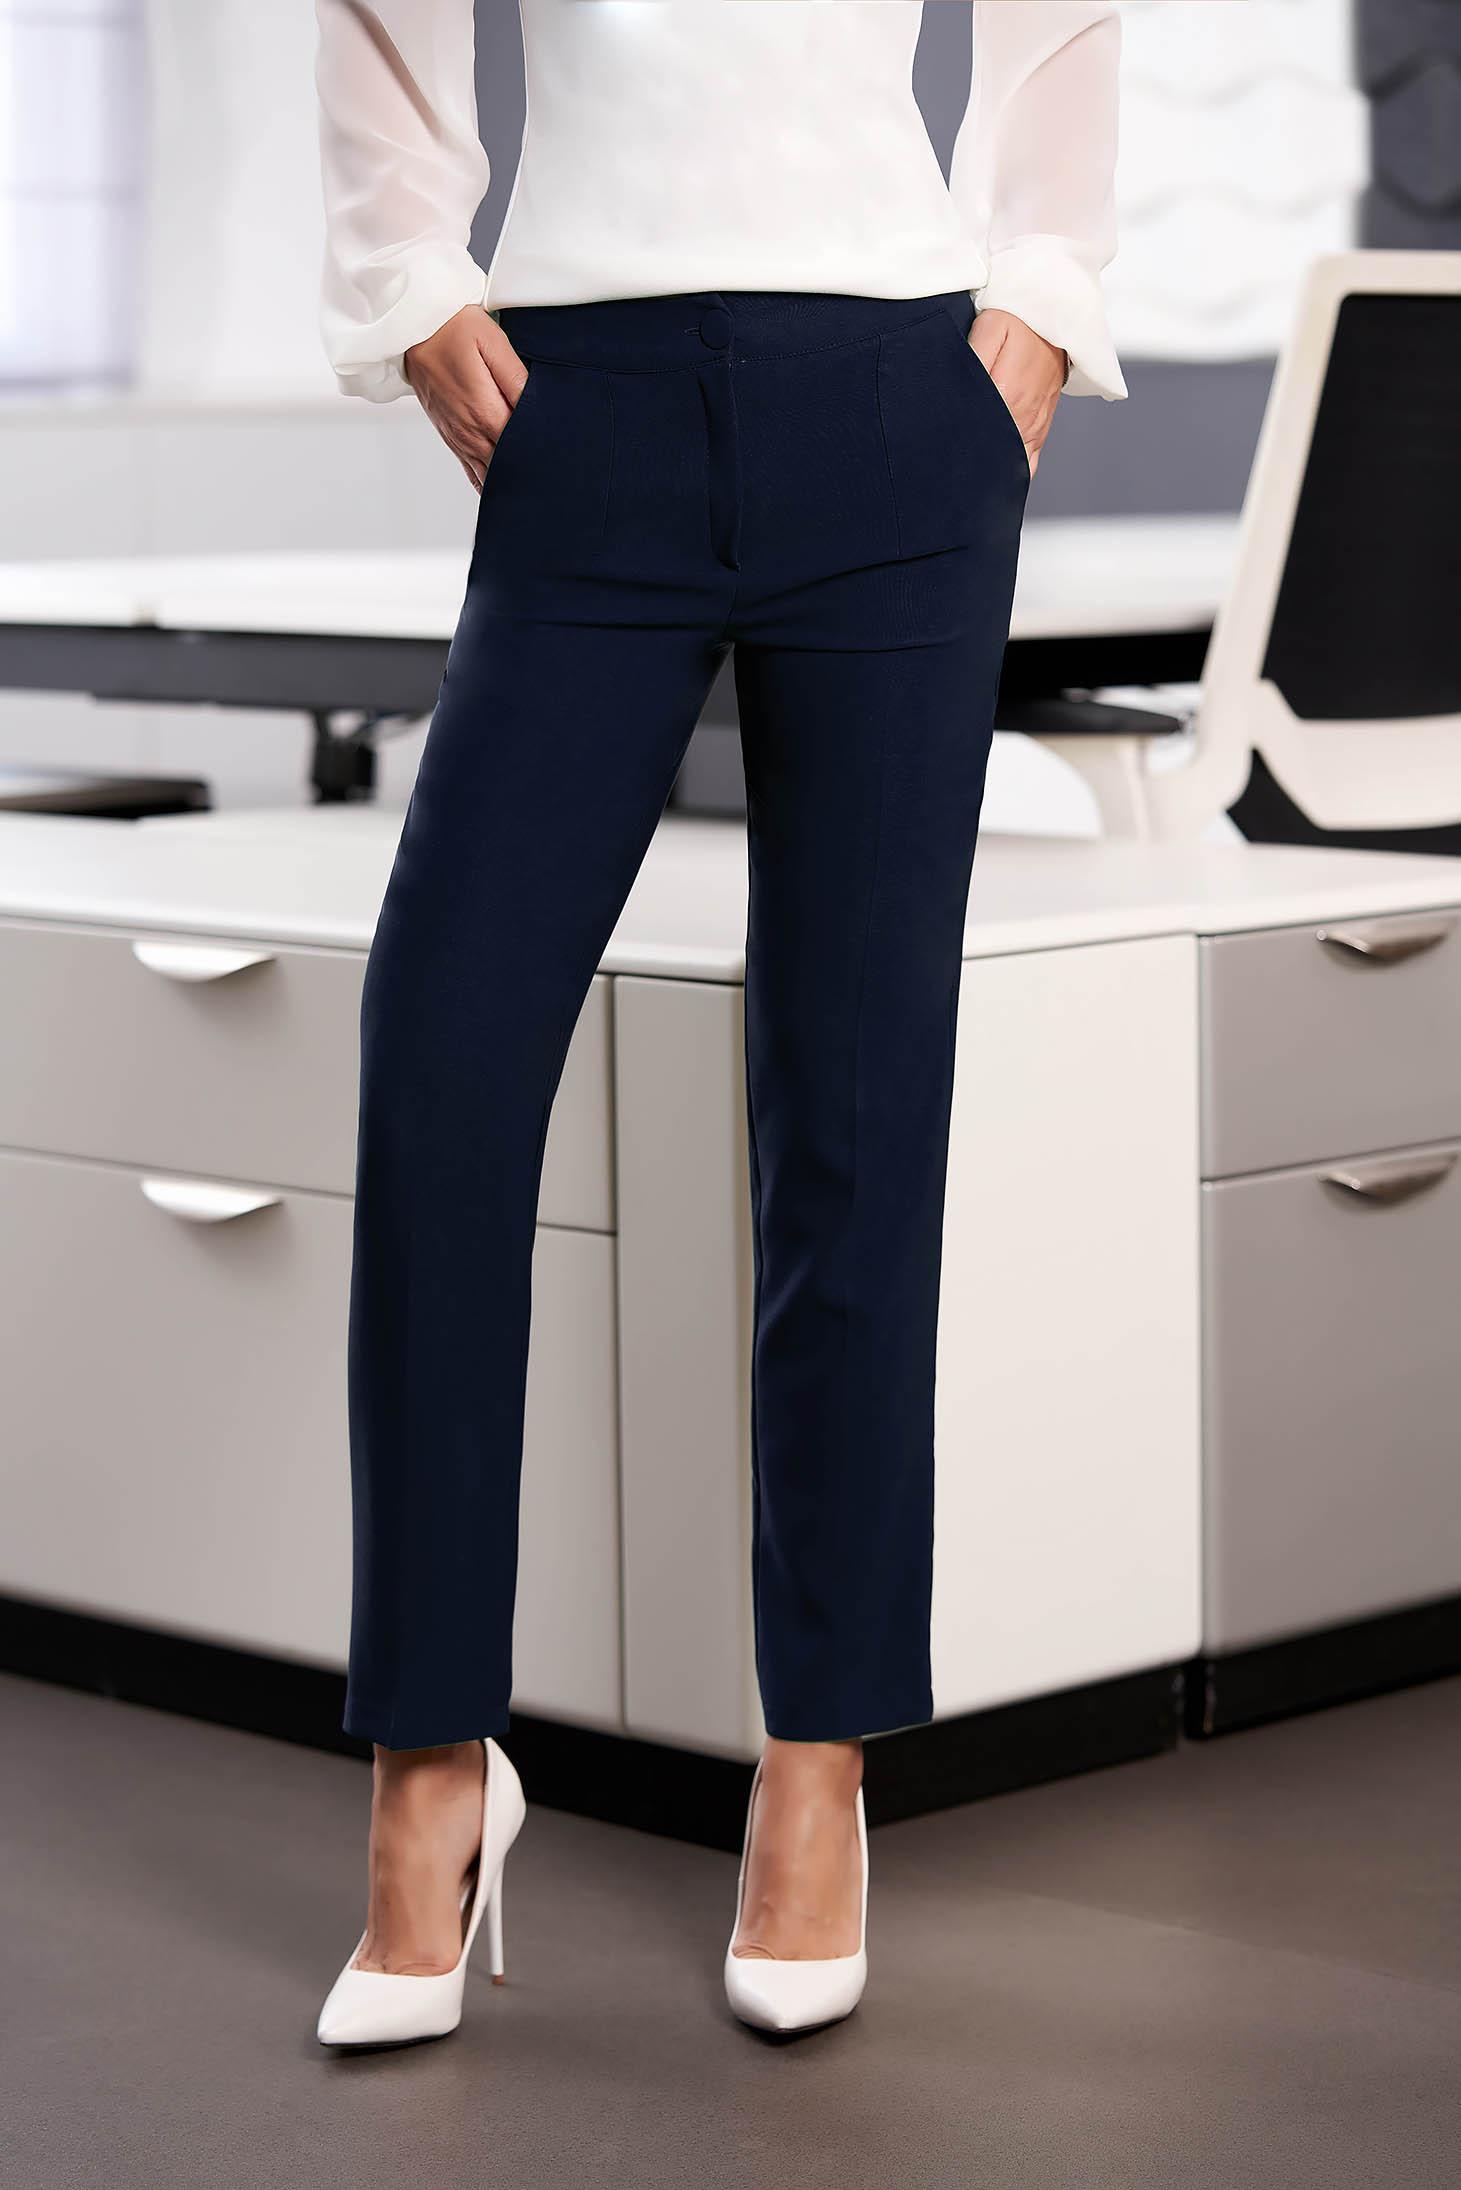 Pantaloni Artista albastru-inchis office din stofa cu talie medie si croi drept